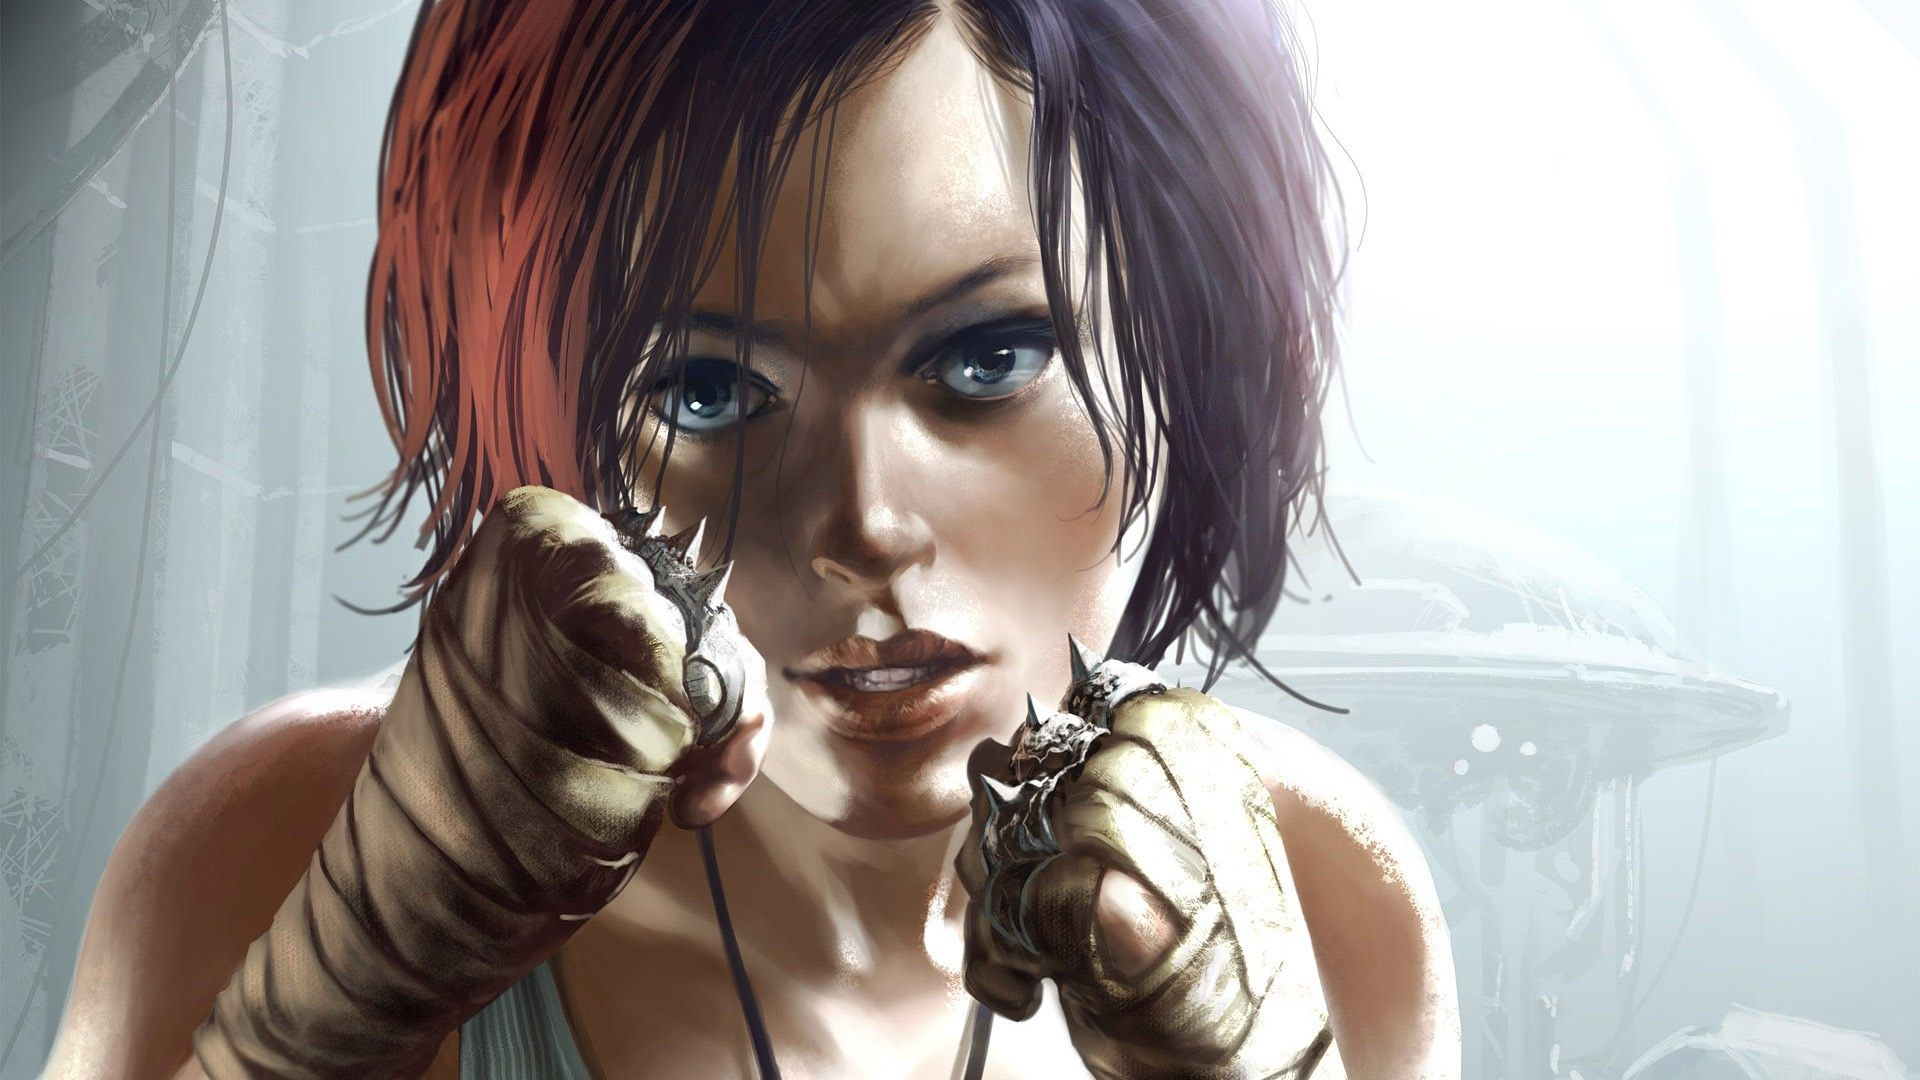 artwork, #fantasy art, #Remember Me, #fantasy girl, #boxing, #Tomasz  Jedruszek, #painting, #bare shoulders, #fan art, #di… | Fantasy girl, Boxing  girl, Fantasy art